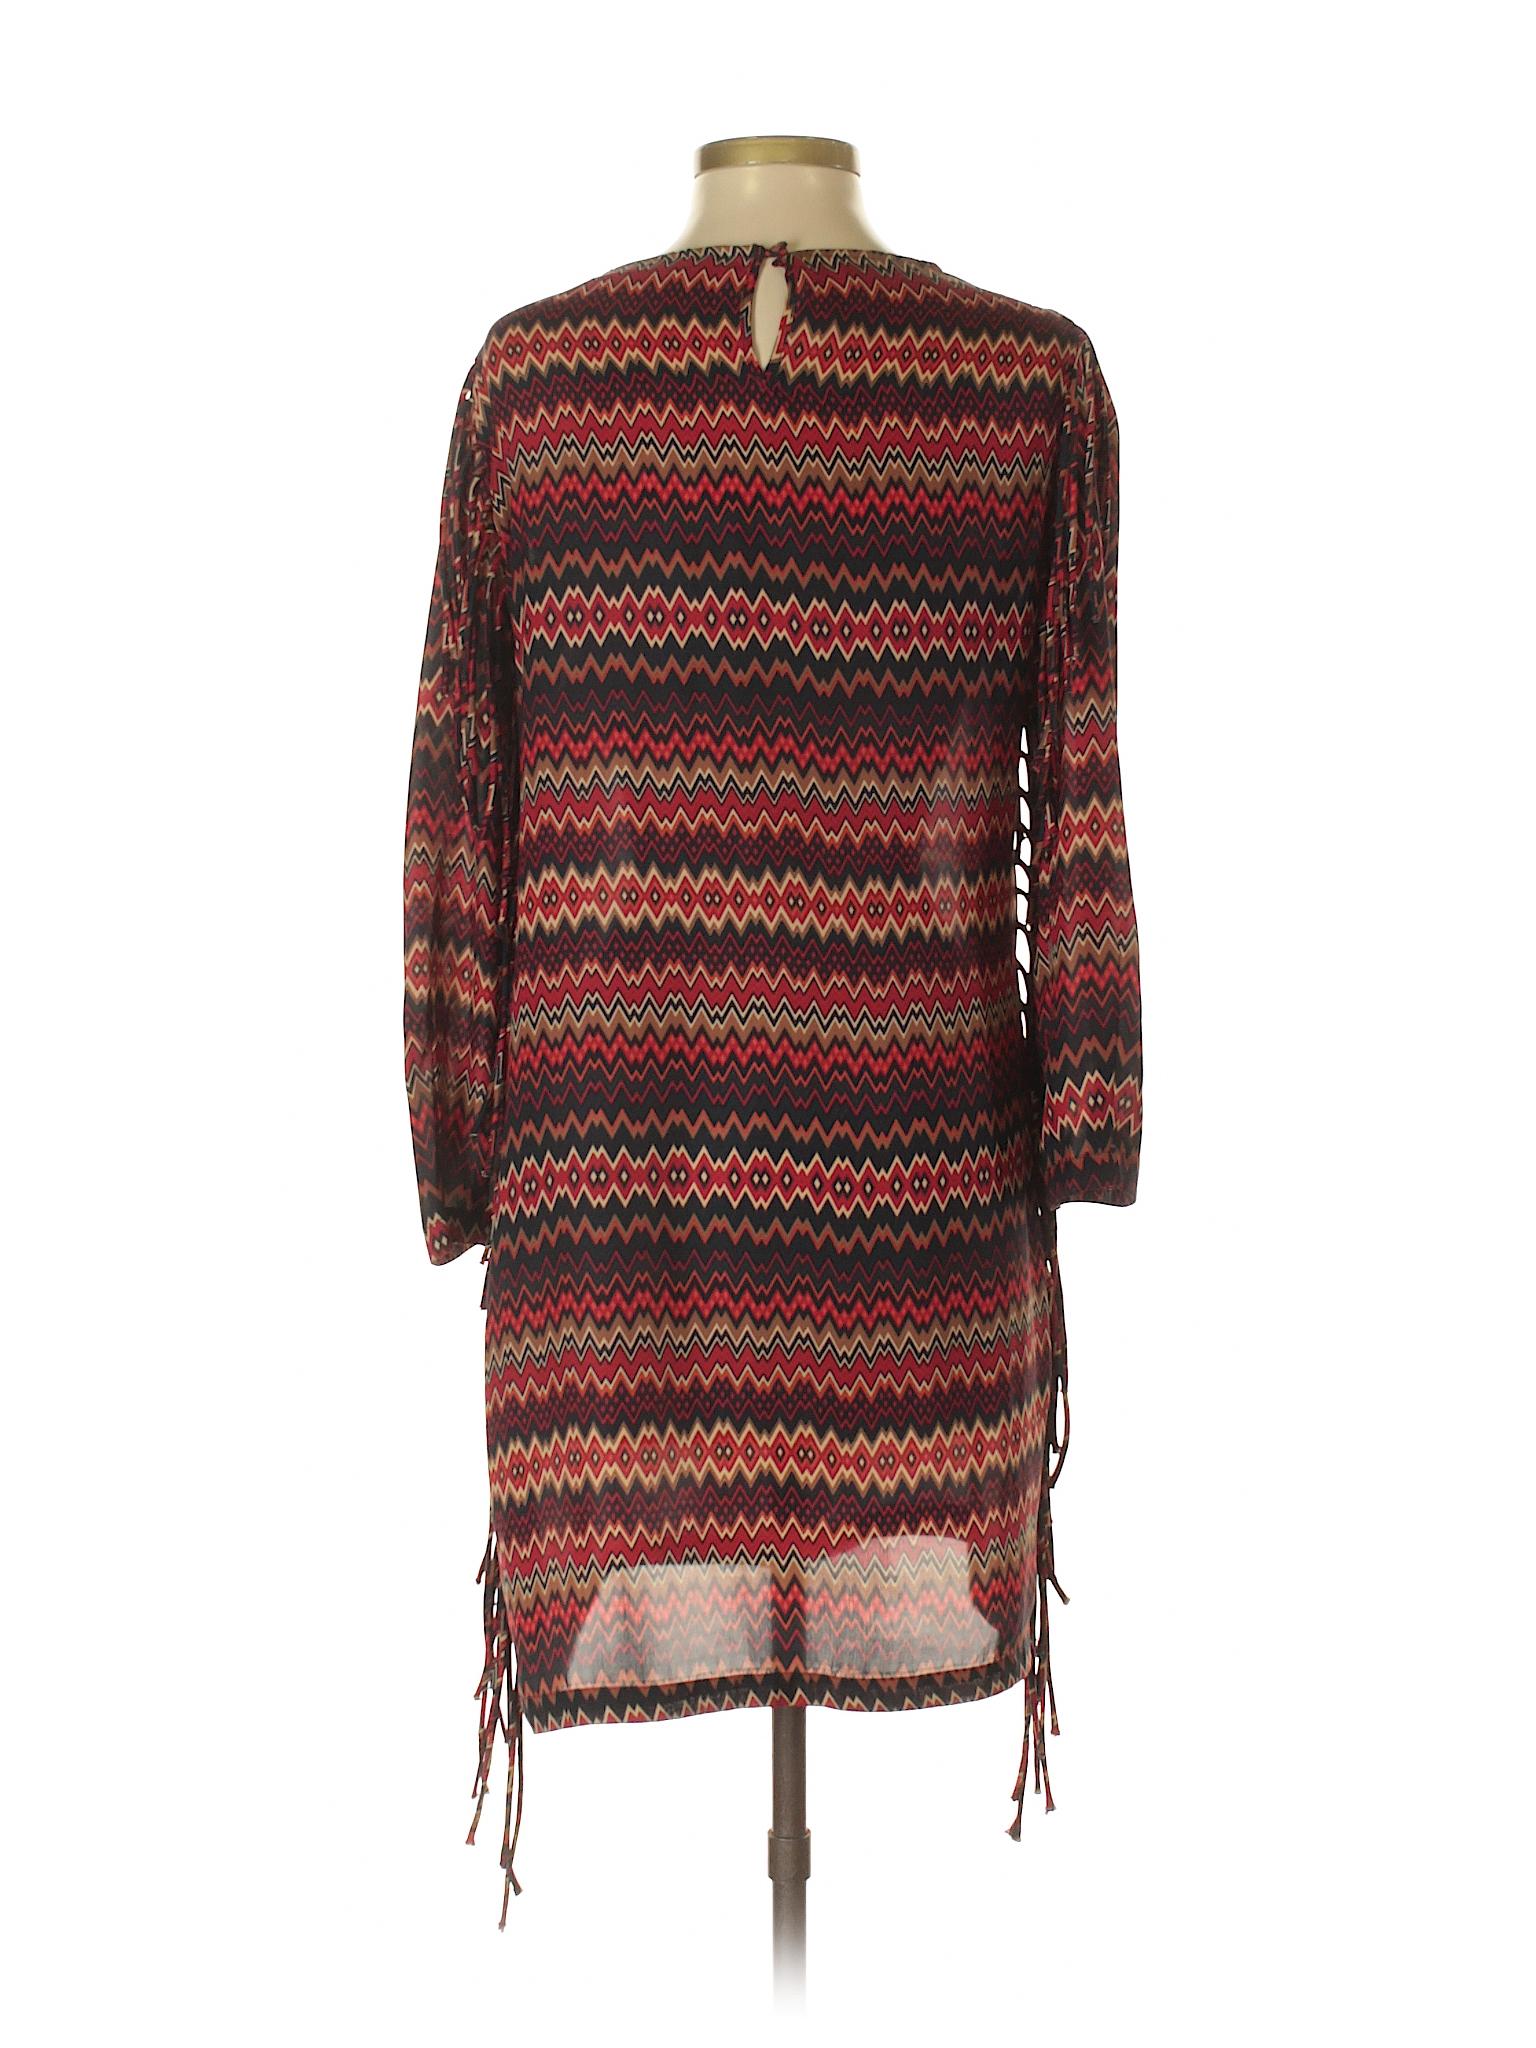 Dress Selling Casual Casual Zara Zara Dress Dress Zara Zara Selling Dress Casual Casual Selling Selling BYWCpqw